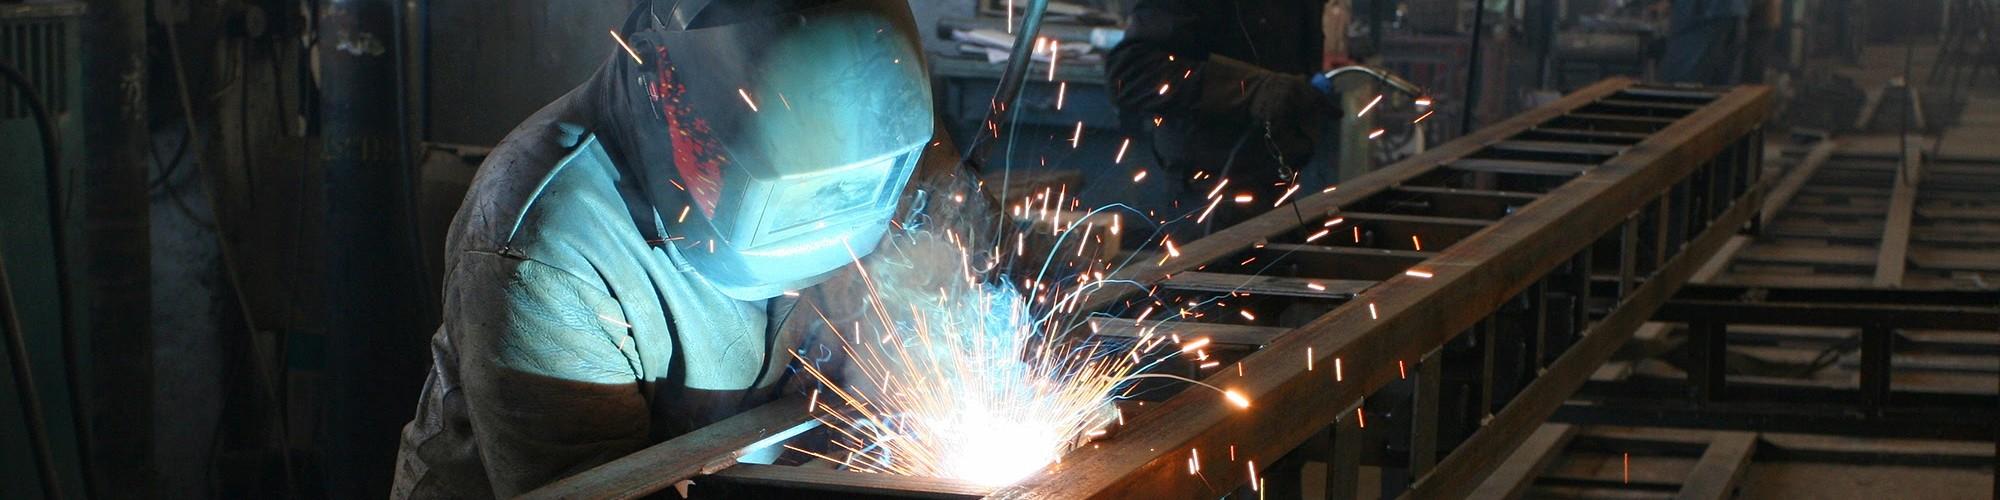 Metal Fabrication Huntington Beach Ca